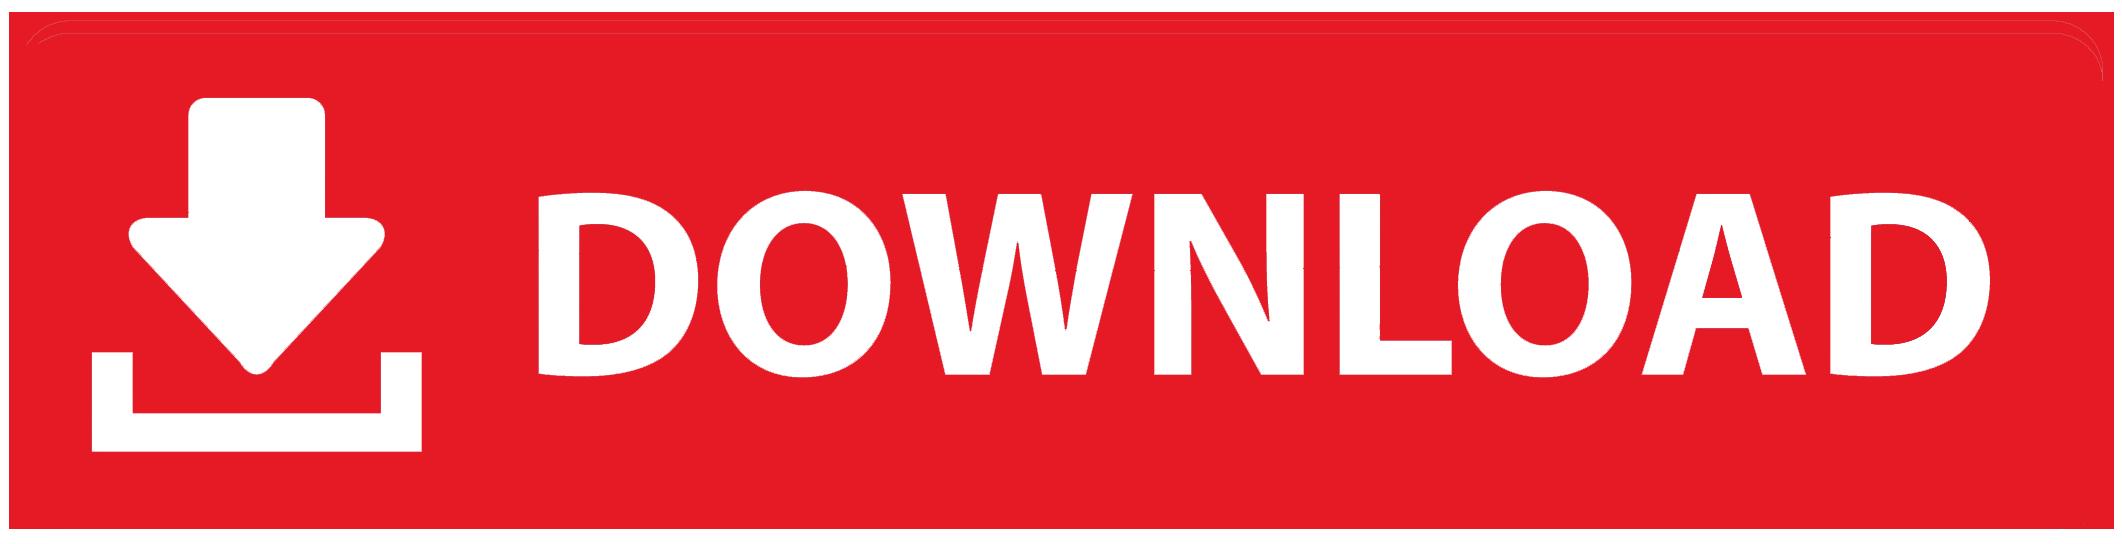 Downloadable-PDF-Button-PNG-Image